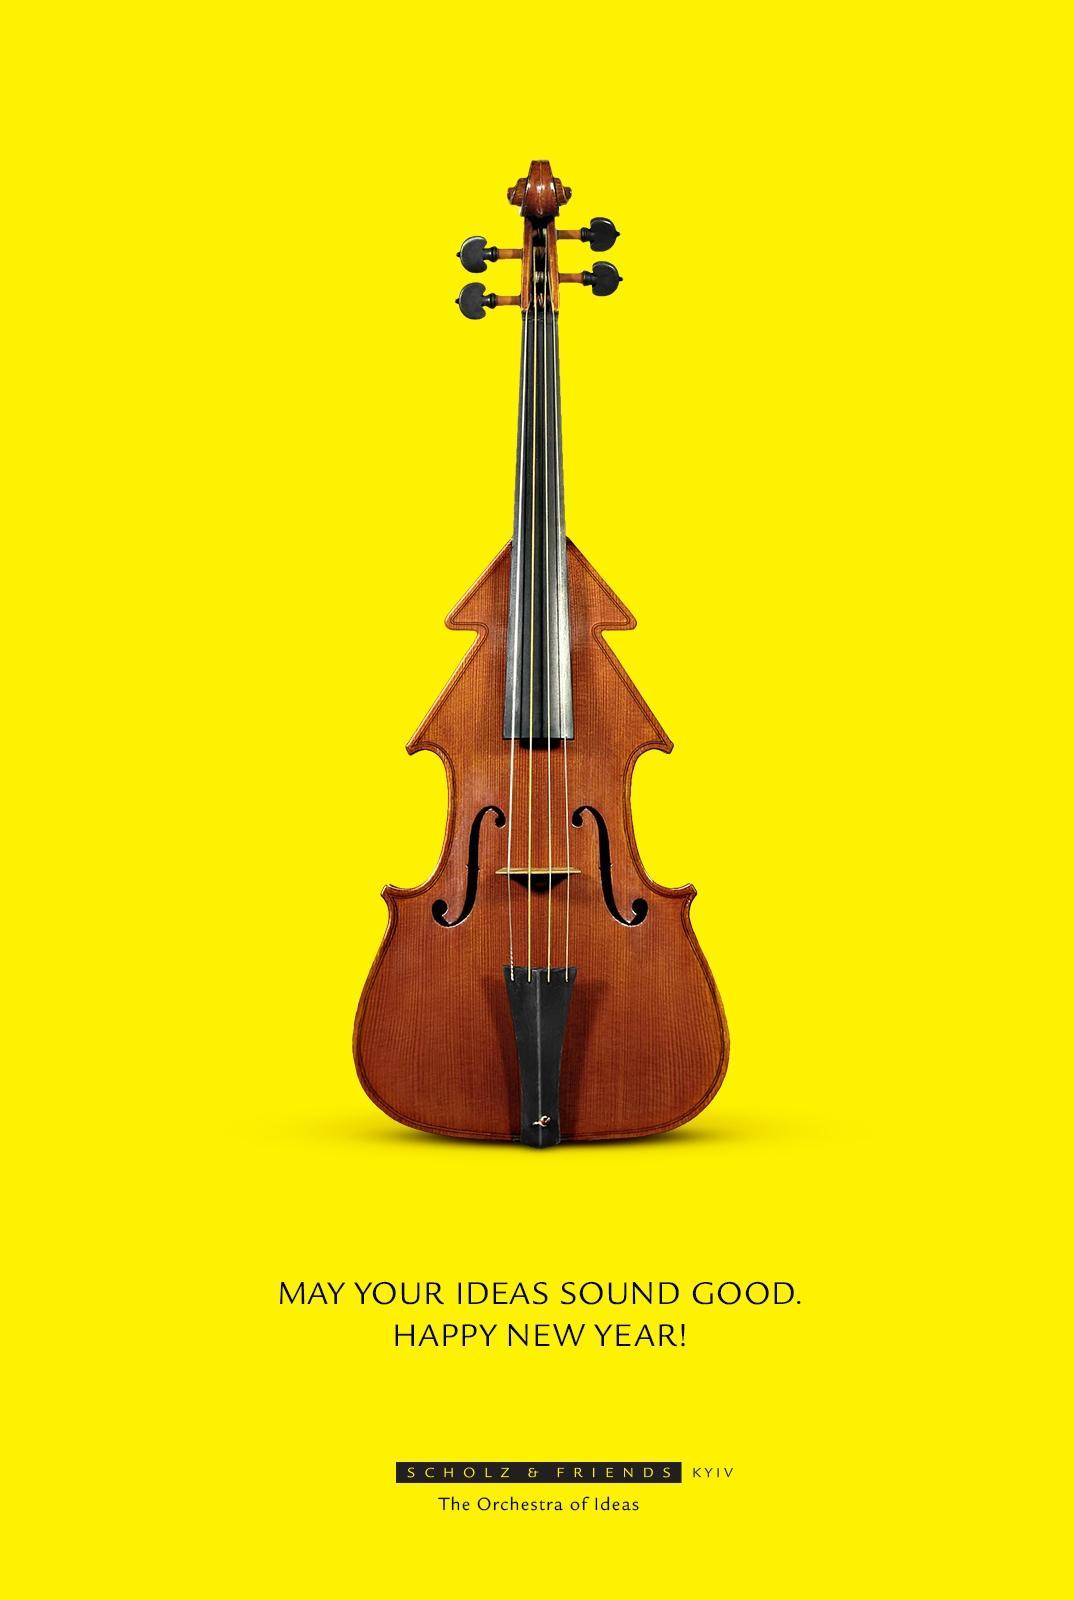 Scholz & Friends Print Ad -  X-mass Violin